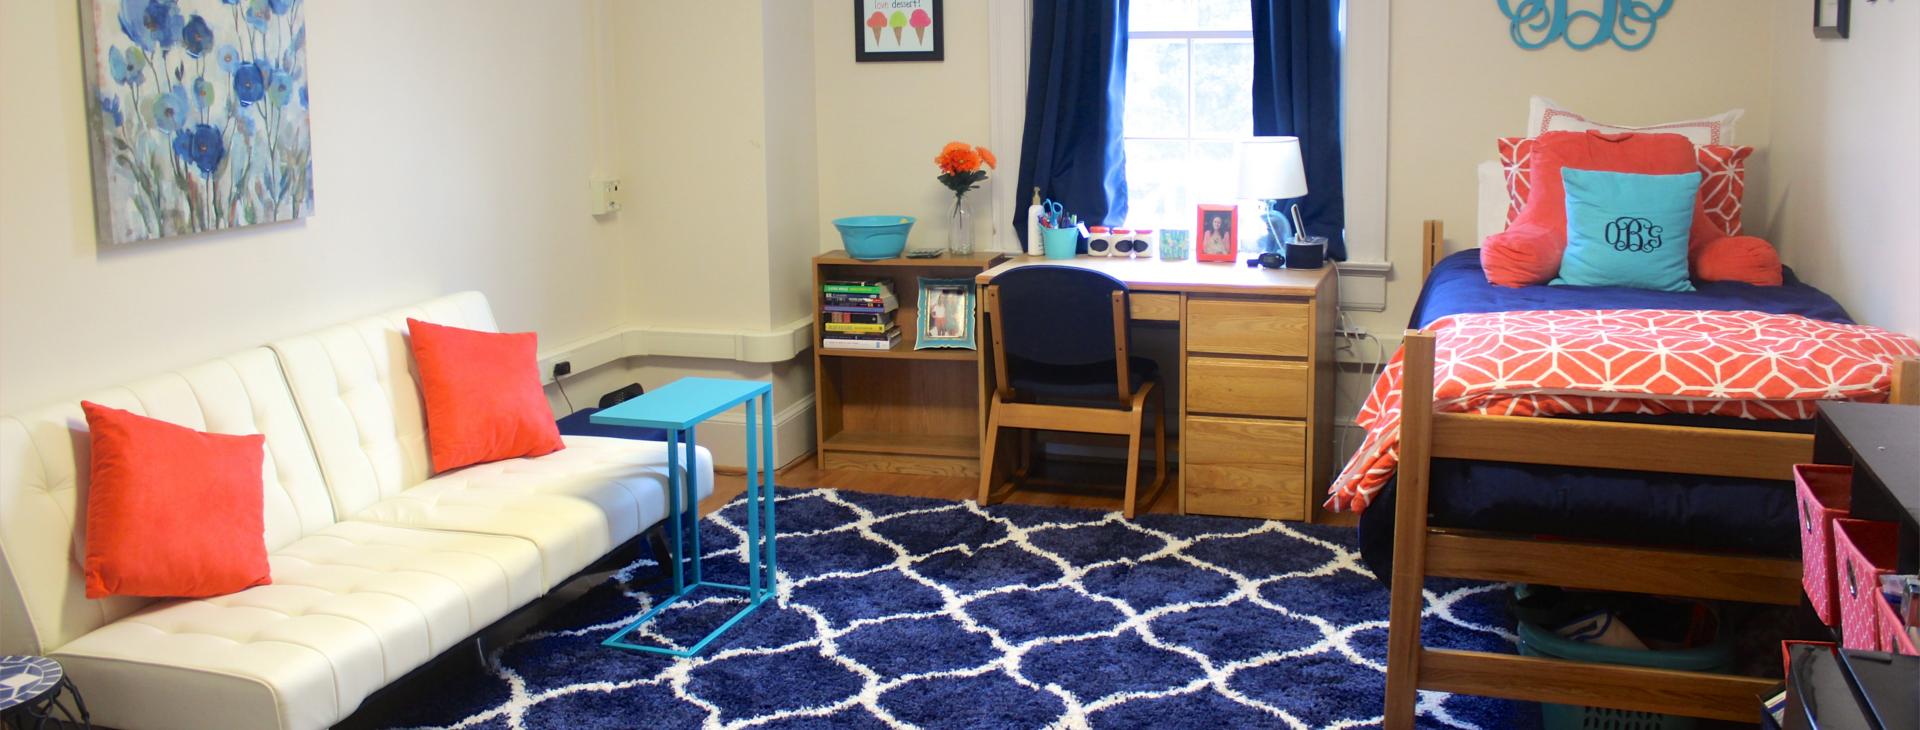 10 Ways to Design Your Dorm By Optimum Utilization of Space Design